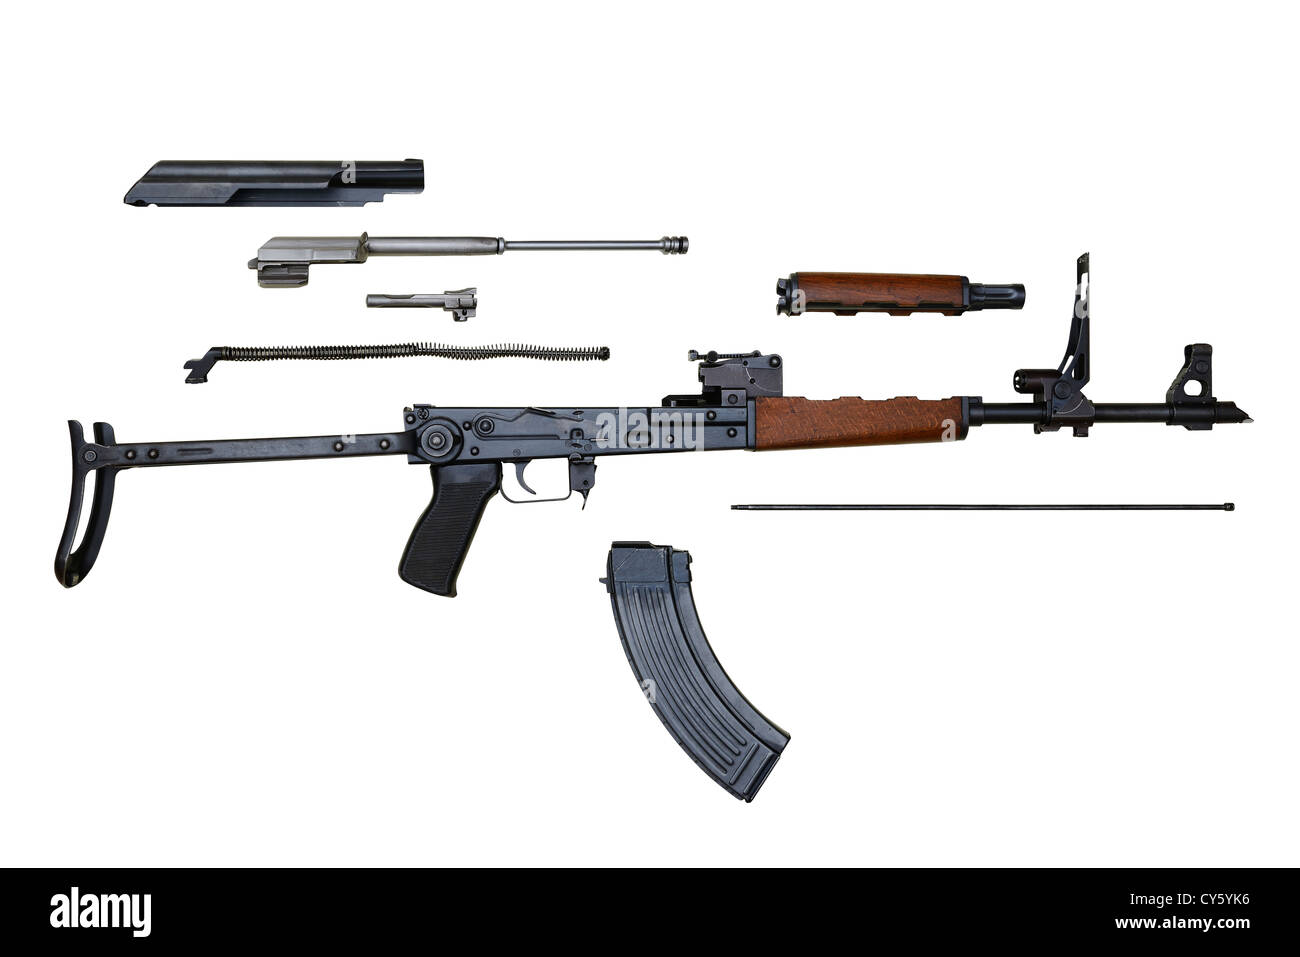 AK47 AKMS Kalashnikov Assault Rifle Stripped For Cleaning. - Stock Image